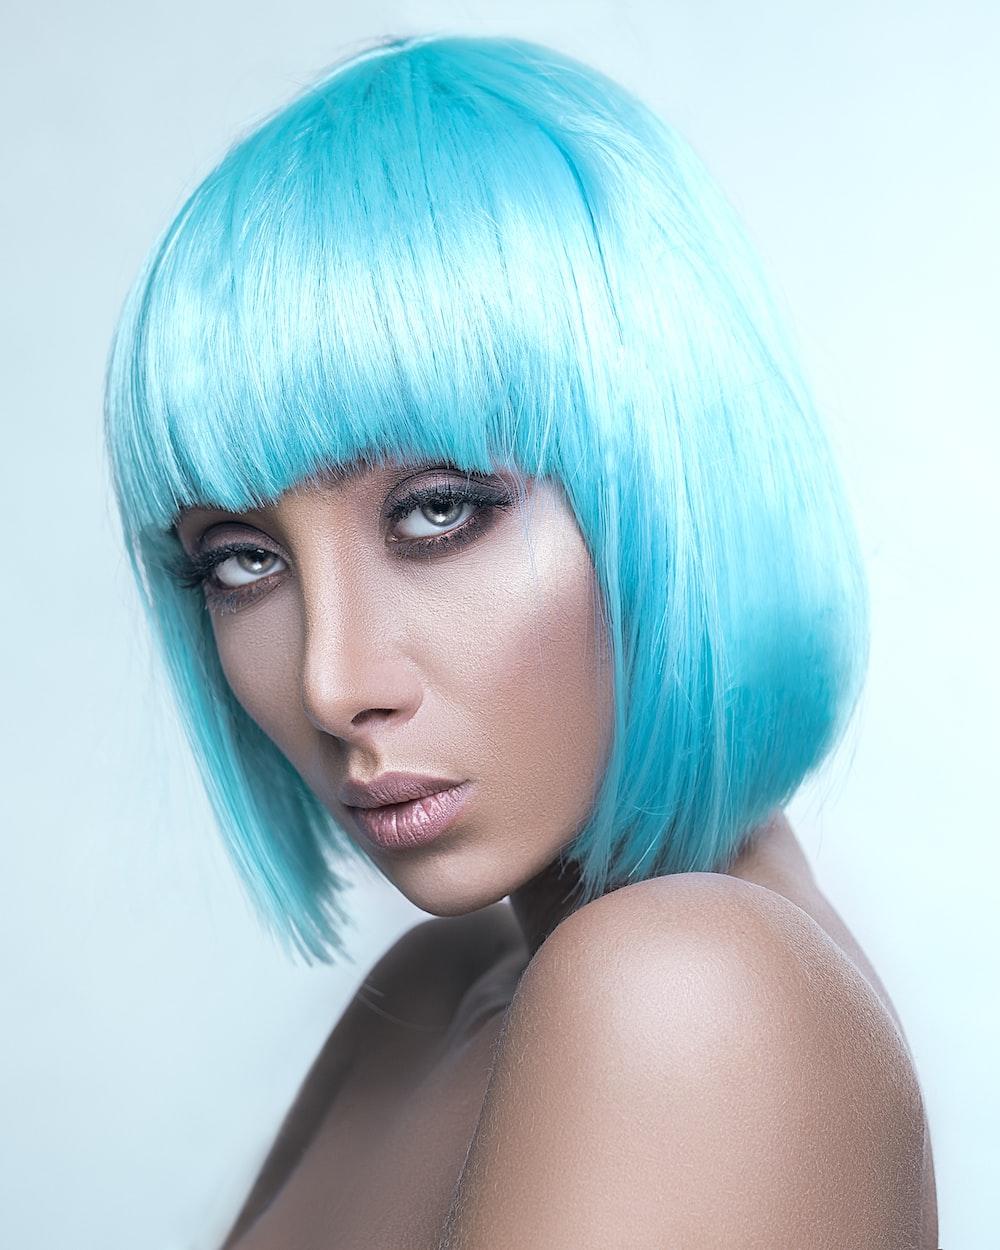 woman wearing blu wig